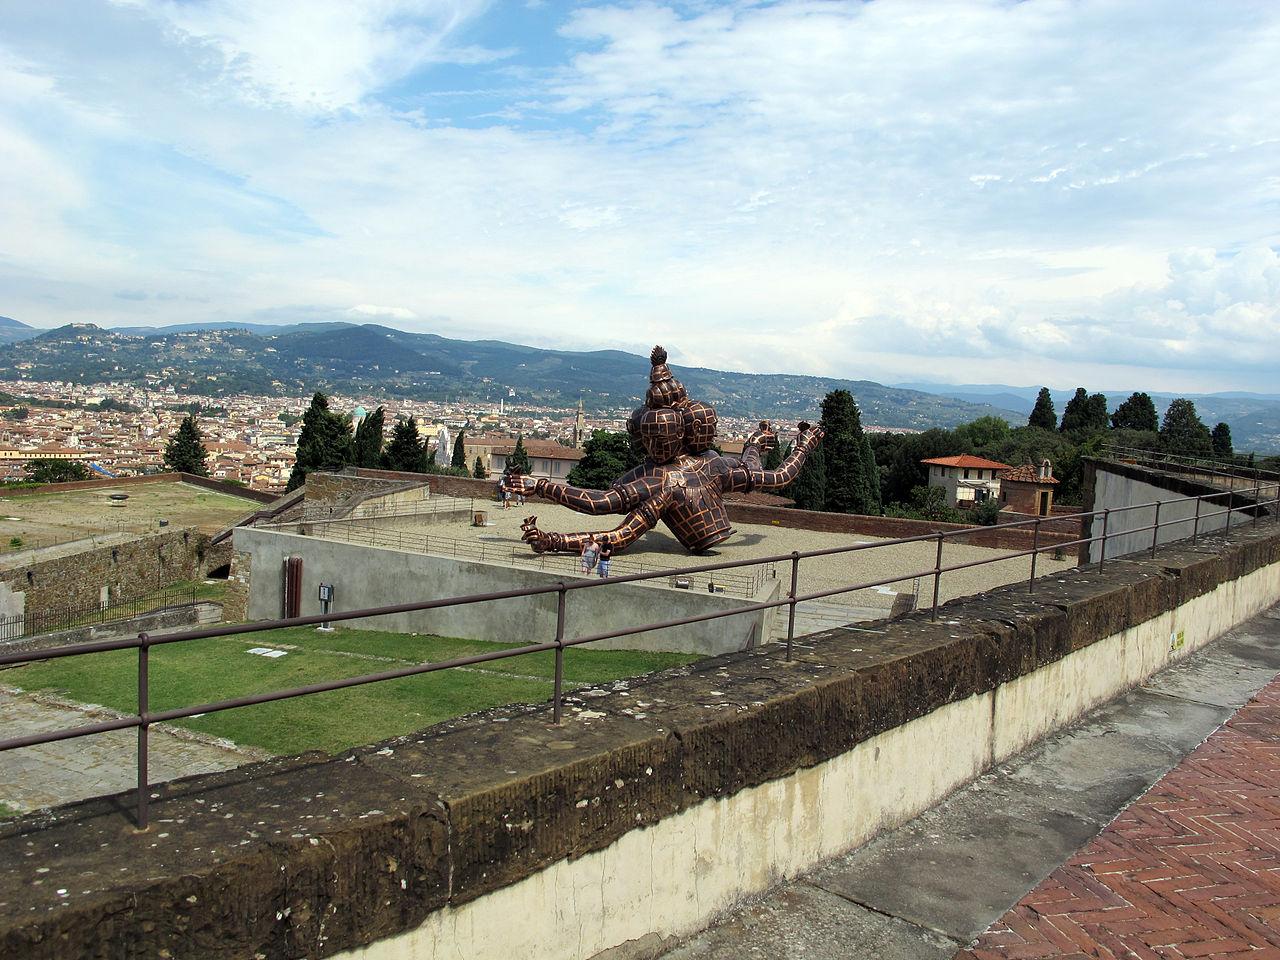 Firenze, Forte belvedere, terazze sui bastioni